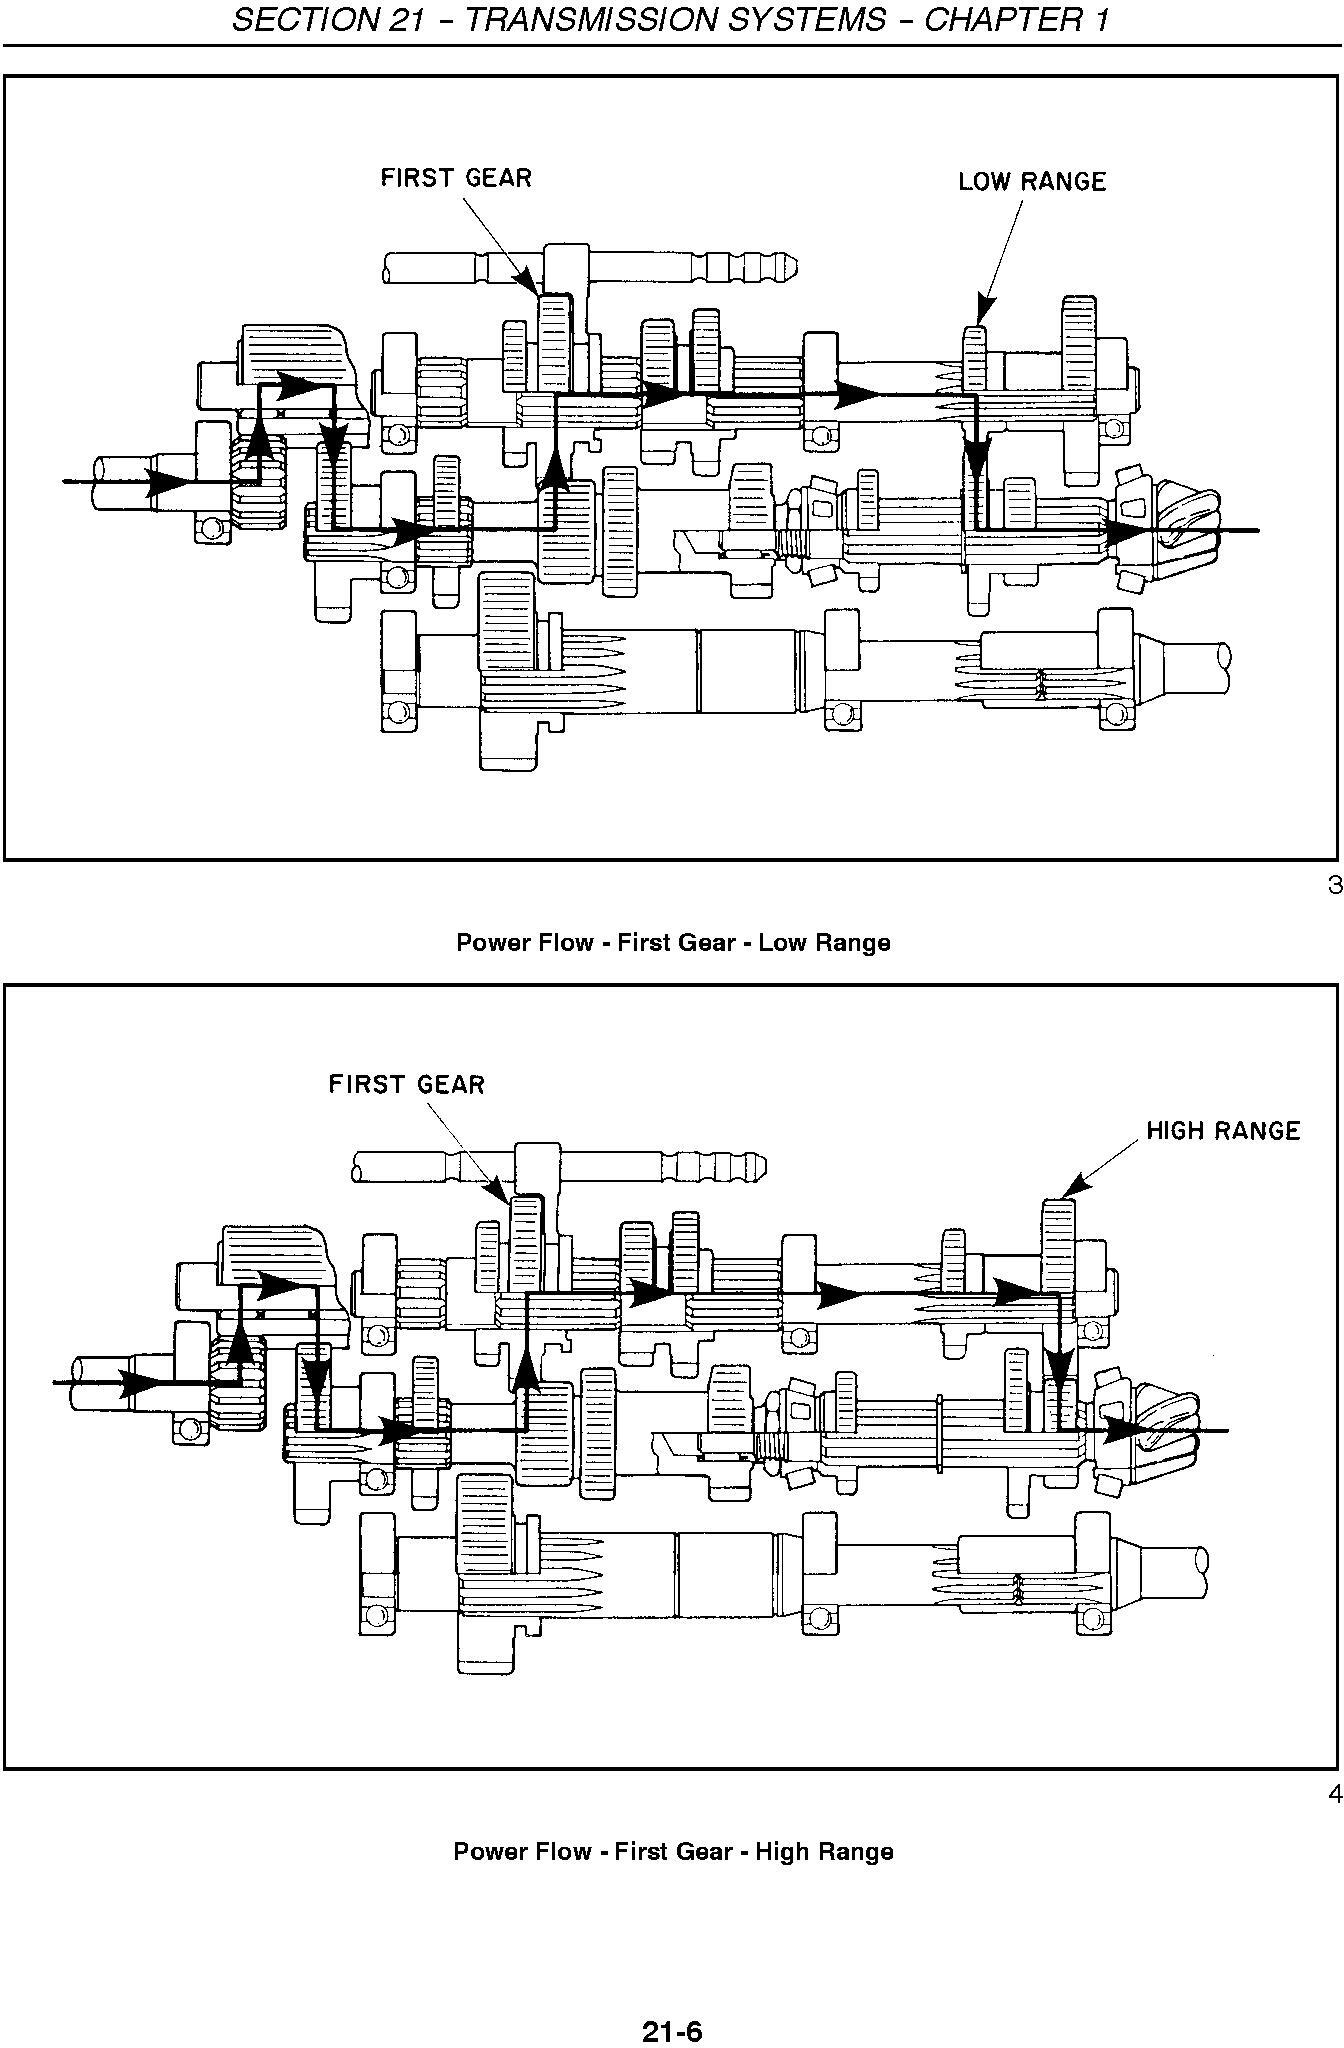 New Holland TC21DA, TC24DA Compact Tractor Complete Service Repair Manual - 1